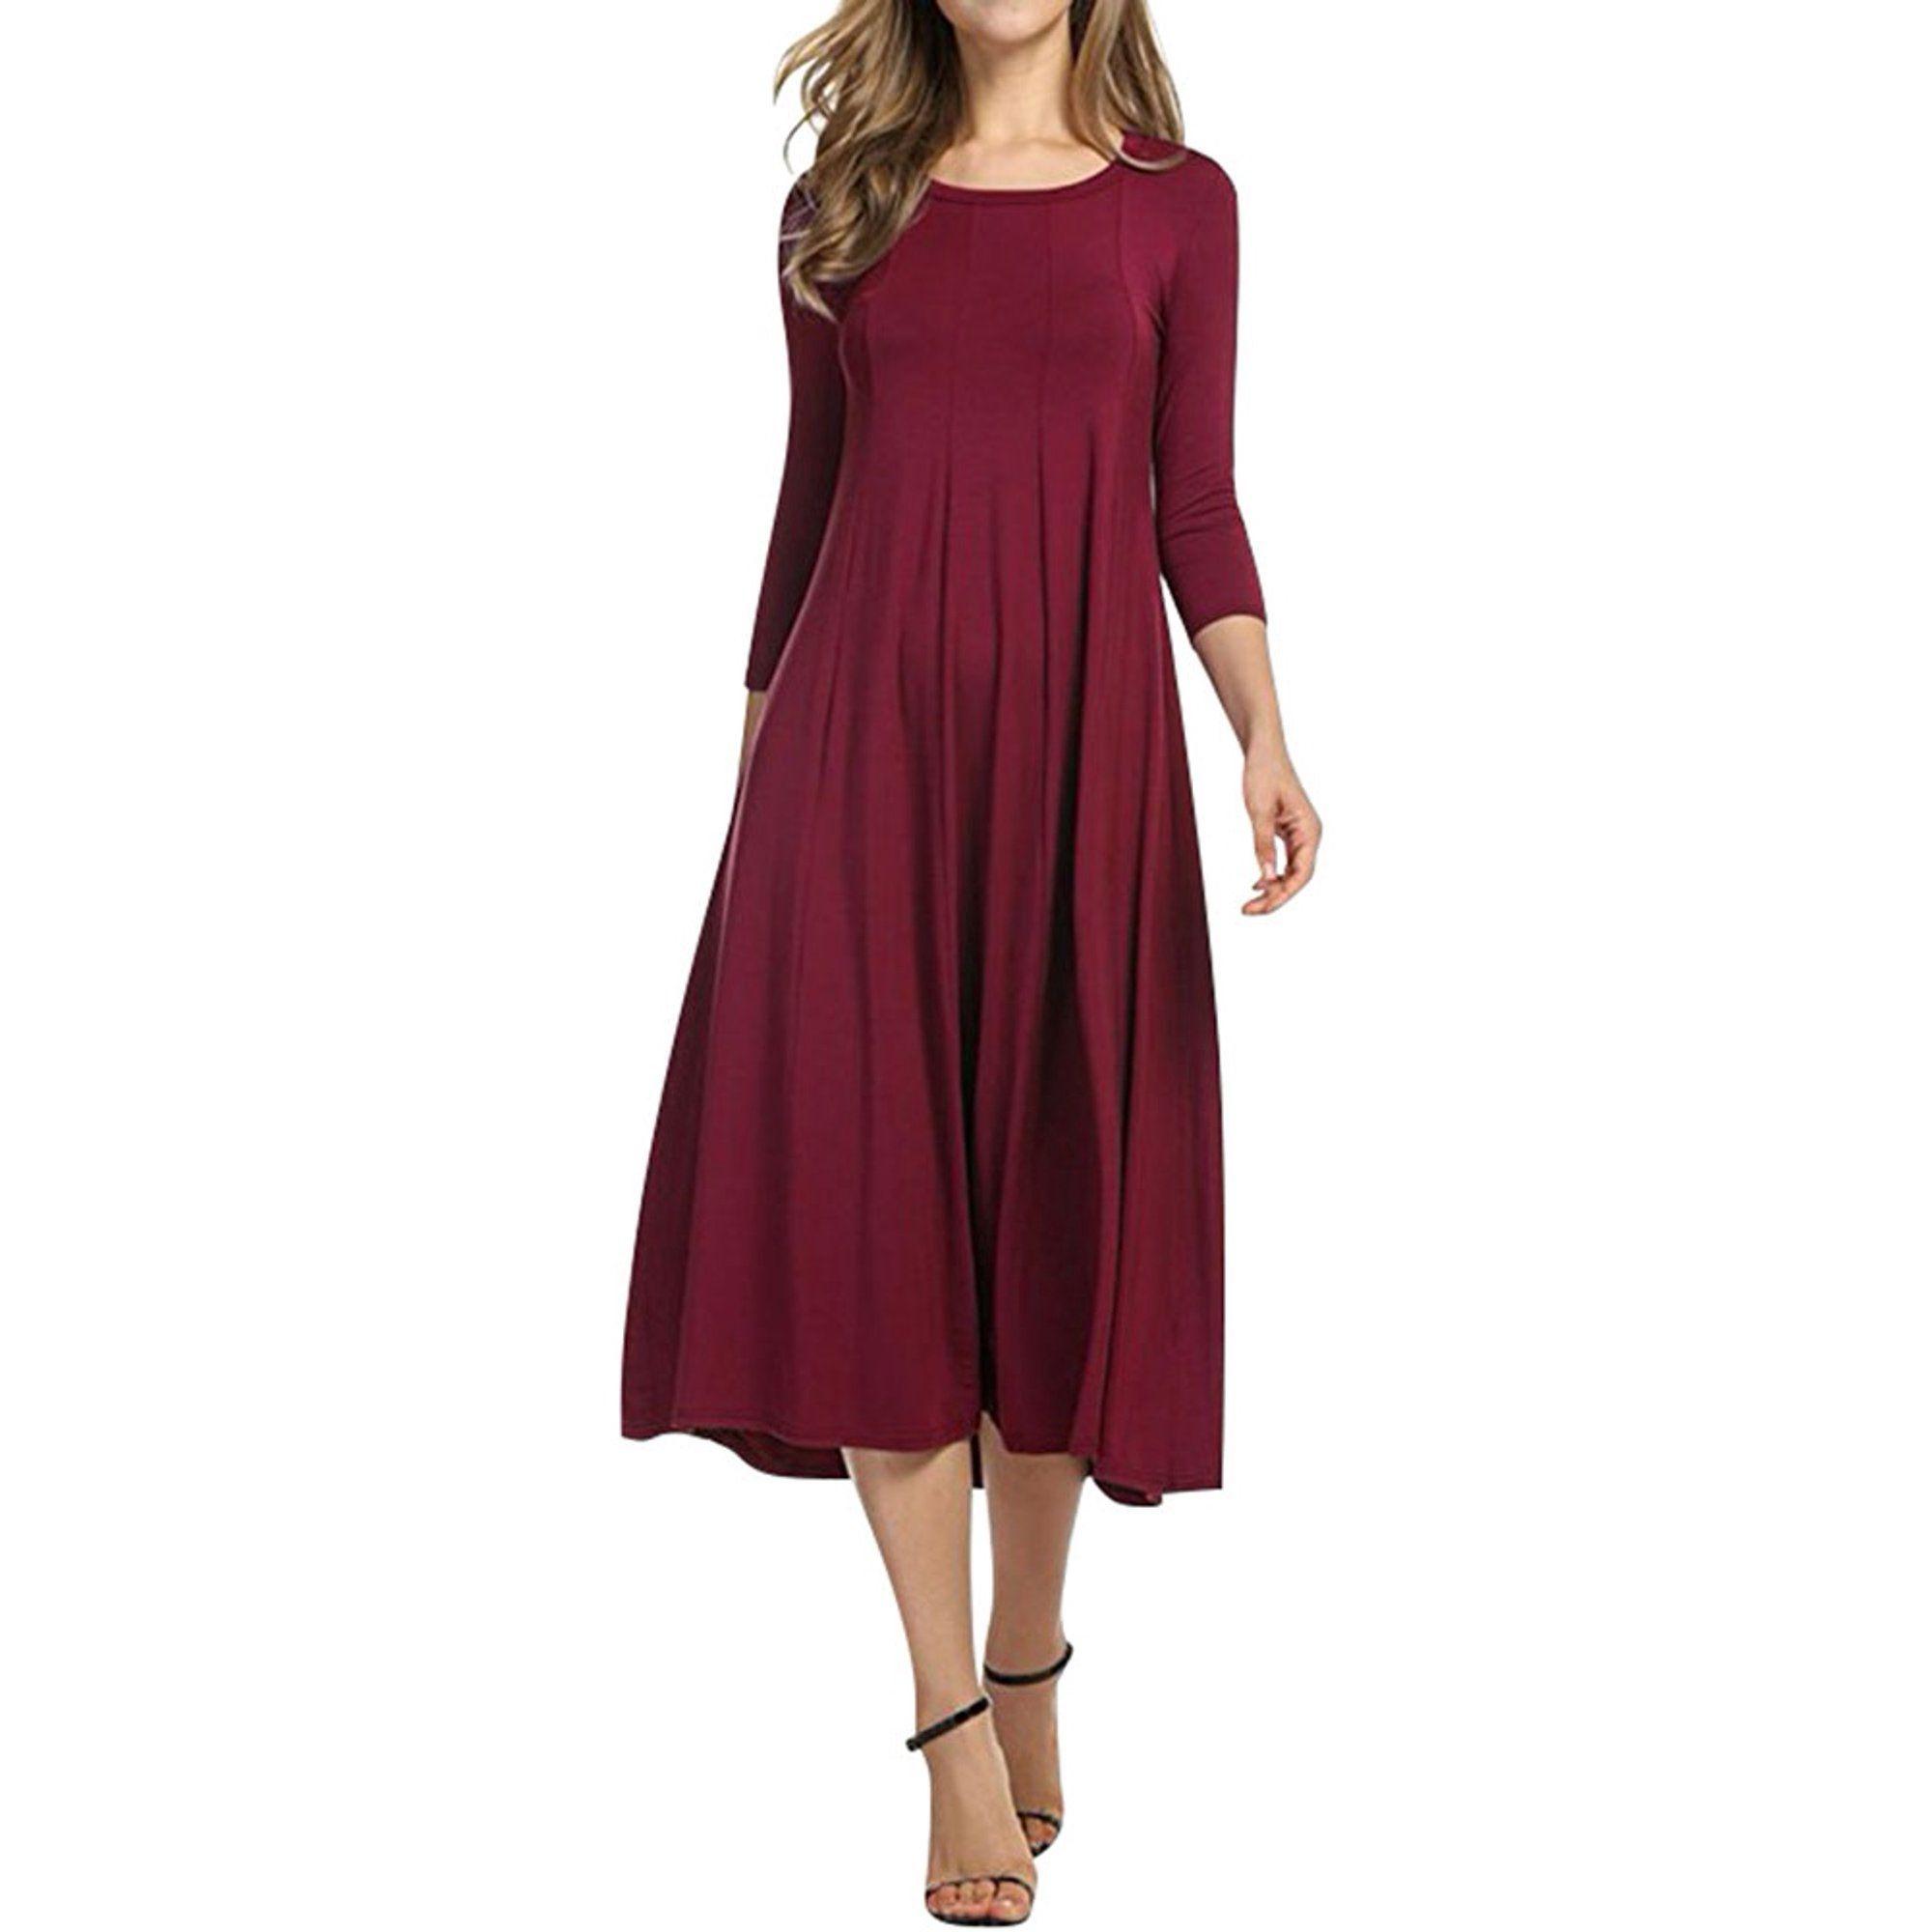 Nlife Nlife Women 3 4 Sleeve Round Neck Swing Midi Dress Walmart Com Vintage Dresses Casual Half Sleeve Dresses Necklines For Dresses [ 2000 x 2000 Pixel ]